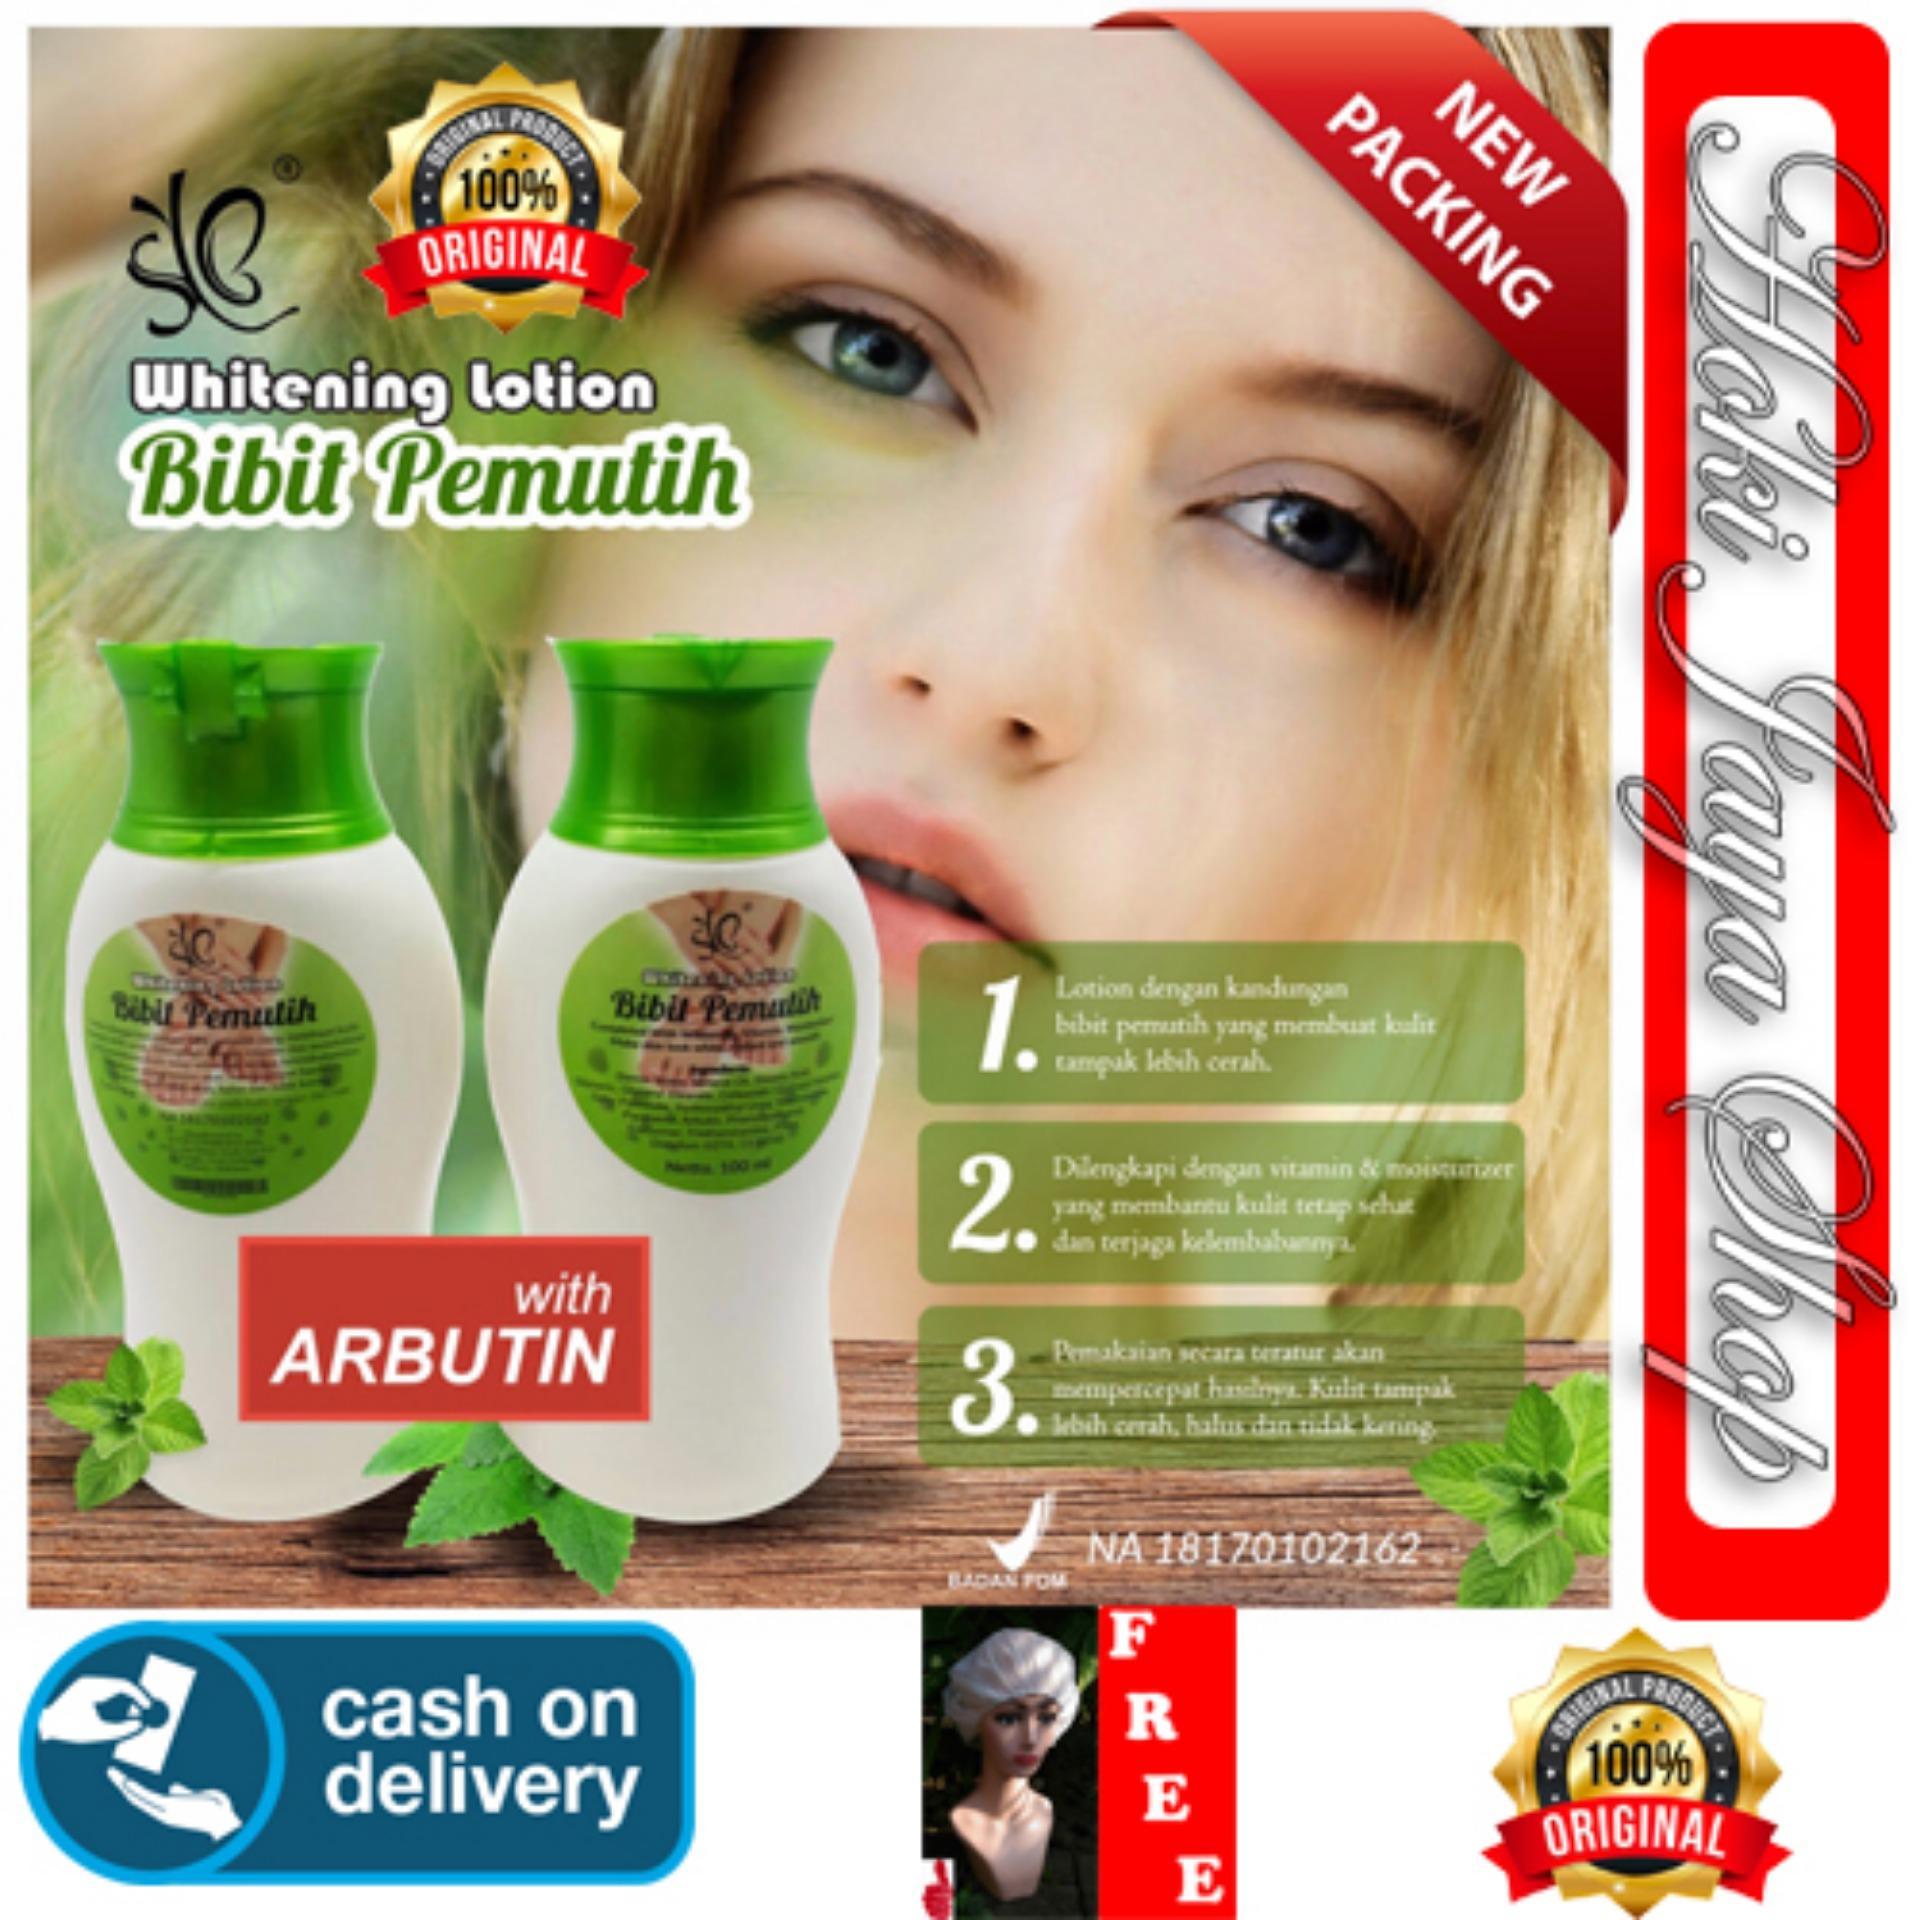 HOKI COD - ORIGINAL 100% Bibit Pemutih Whitening Body Lotion Pemutih Badan BPOM 100ml - Bibit Collagen + Gratis Shower Cap Putih - Premium